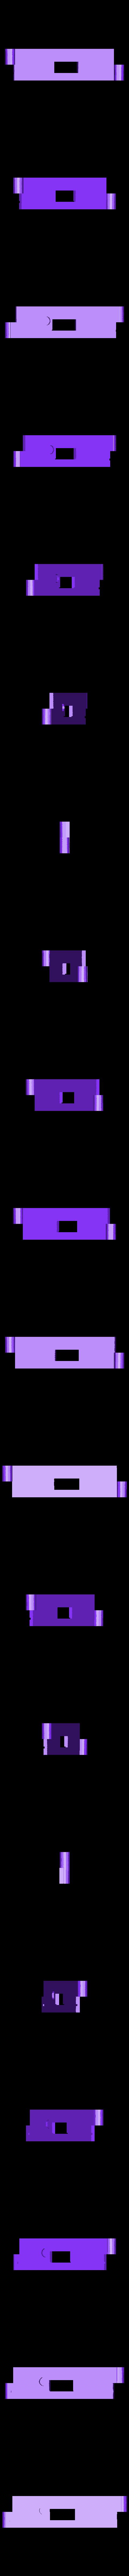 hdmi2.stl Download free SCAD file Modular raspberry pi case • 3D print object, Lassaalk